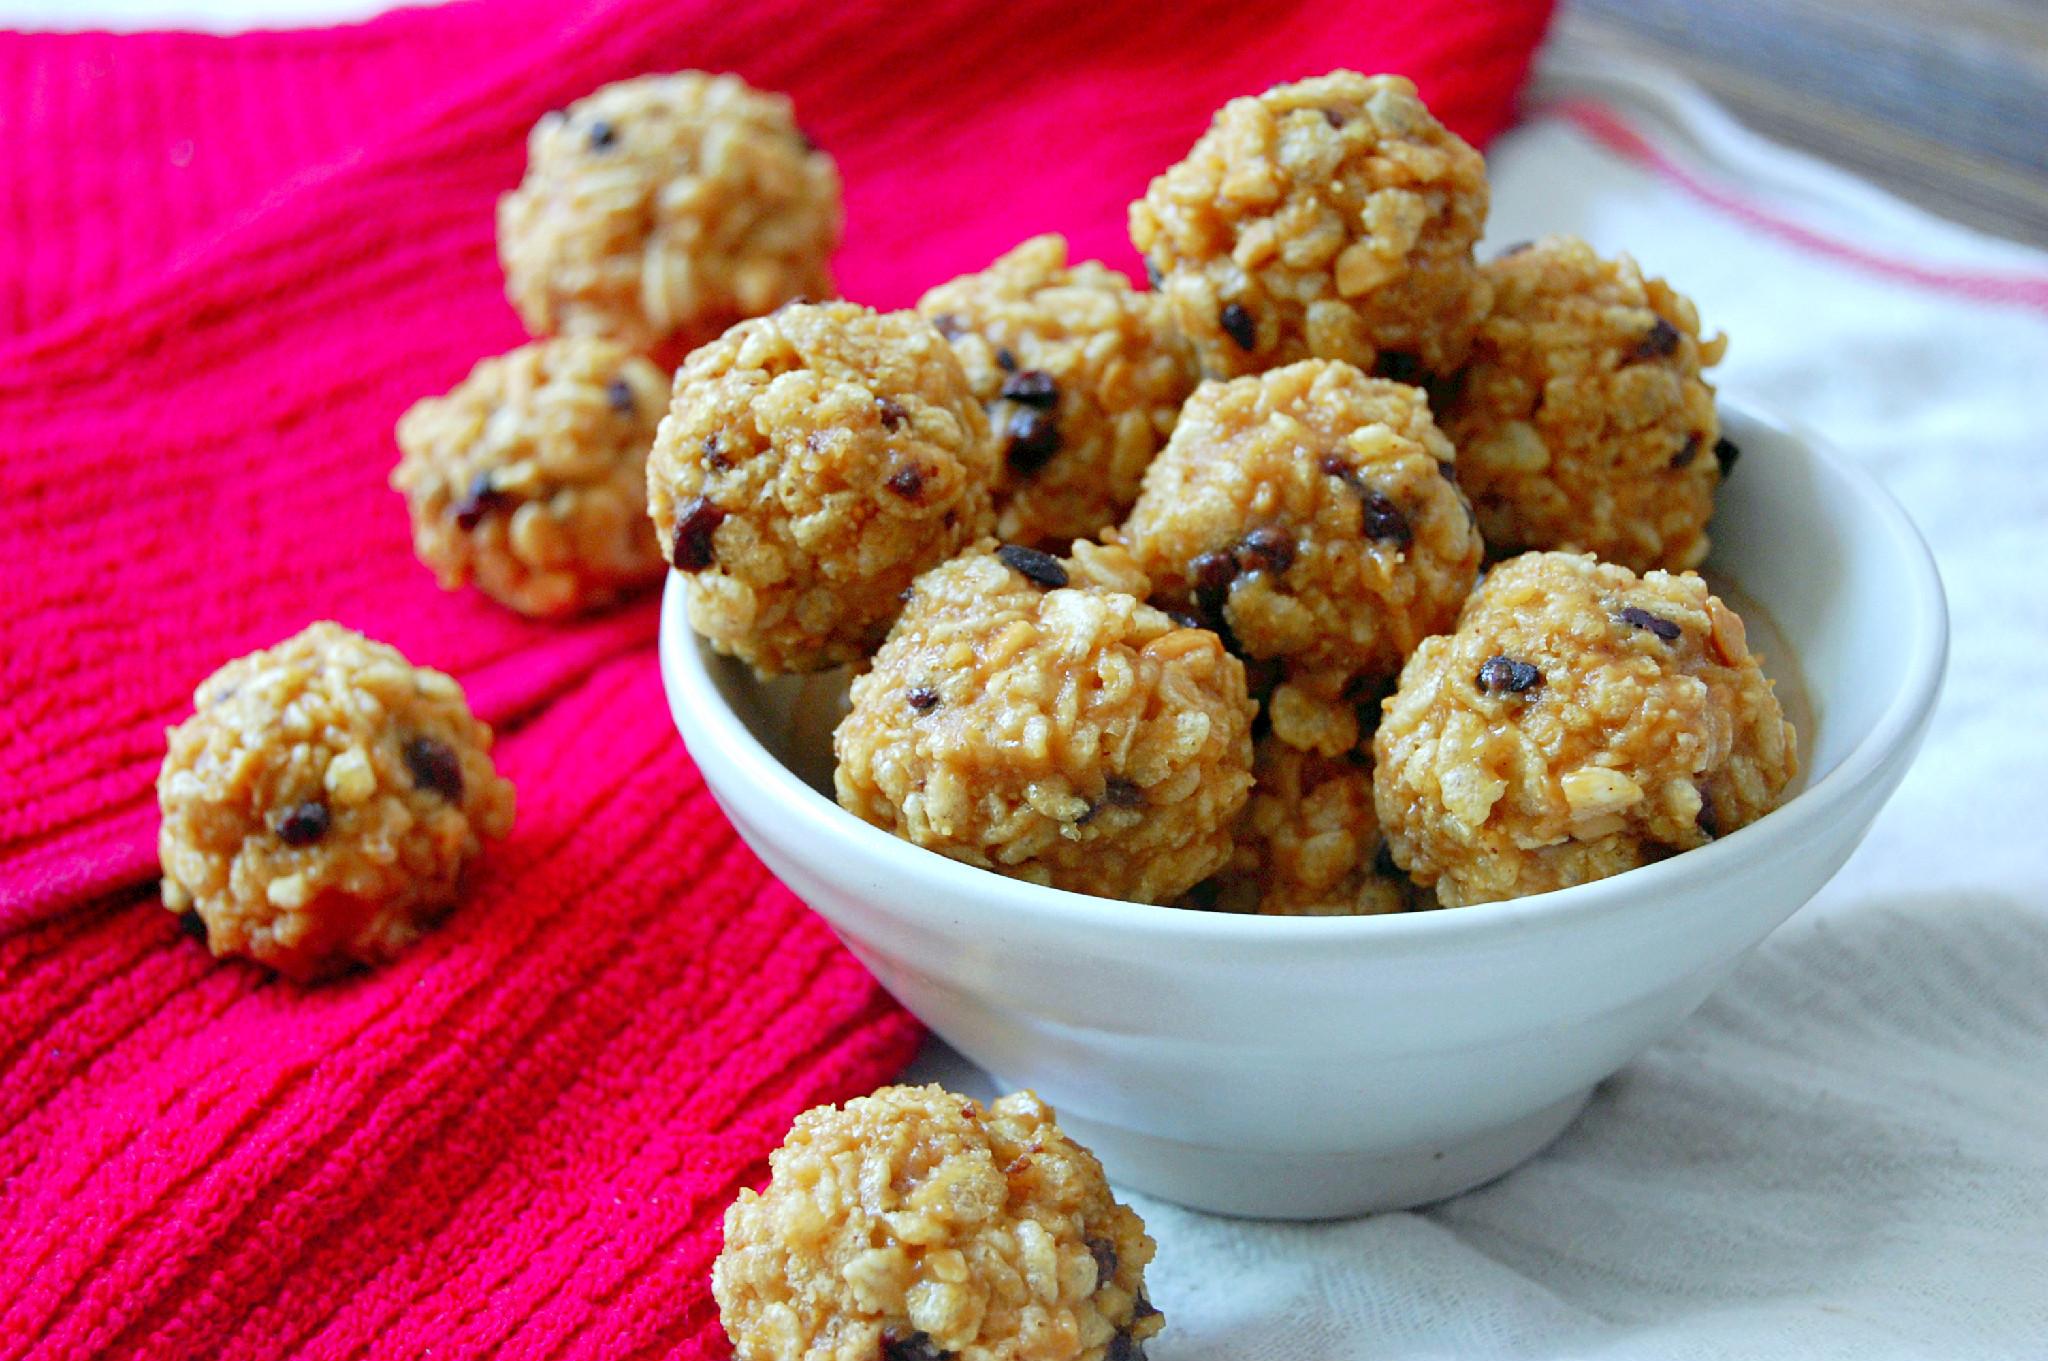 Peanut Butter Snack Balls | uprootkitchen.com